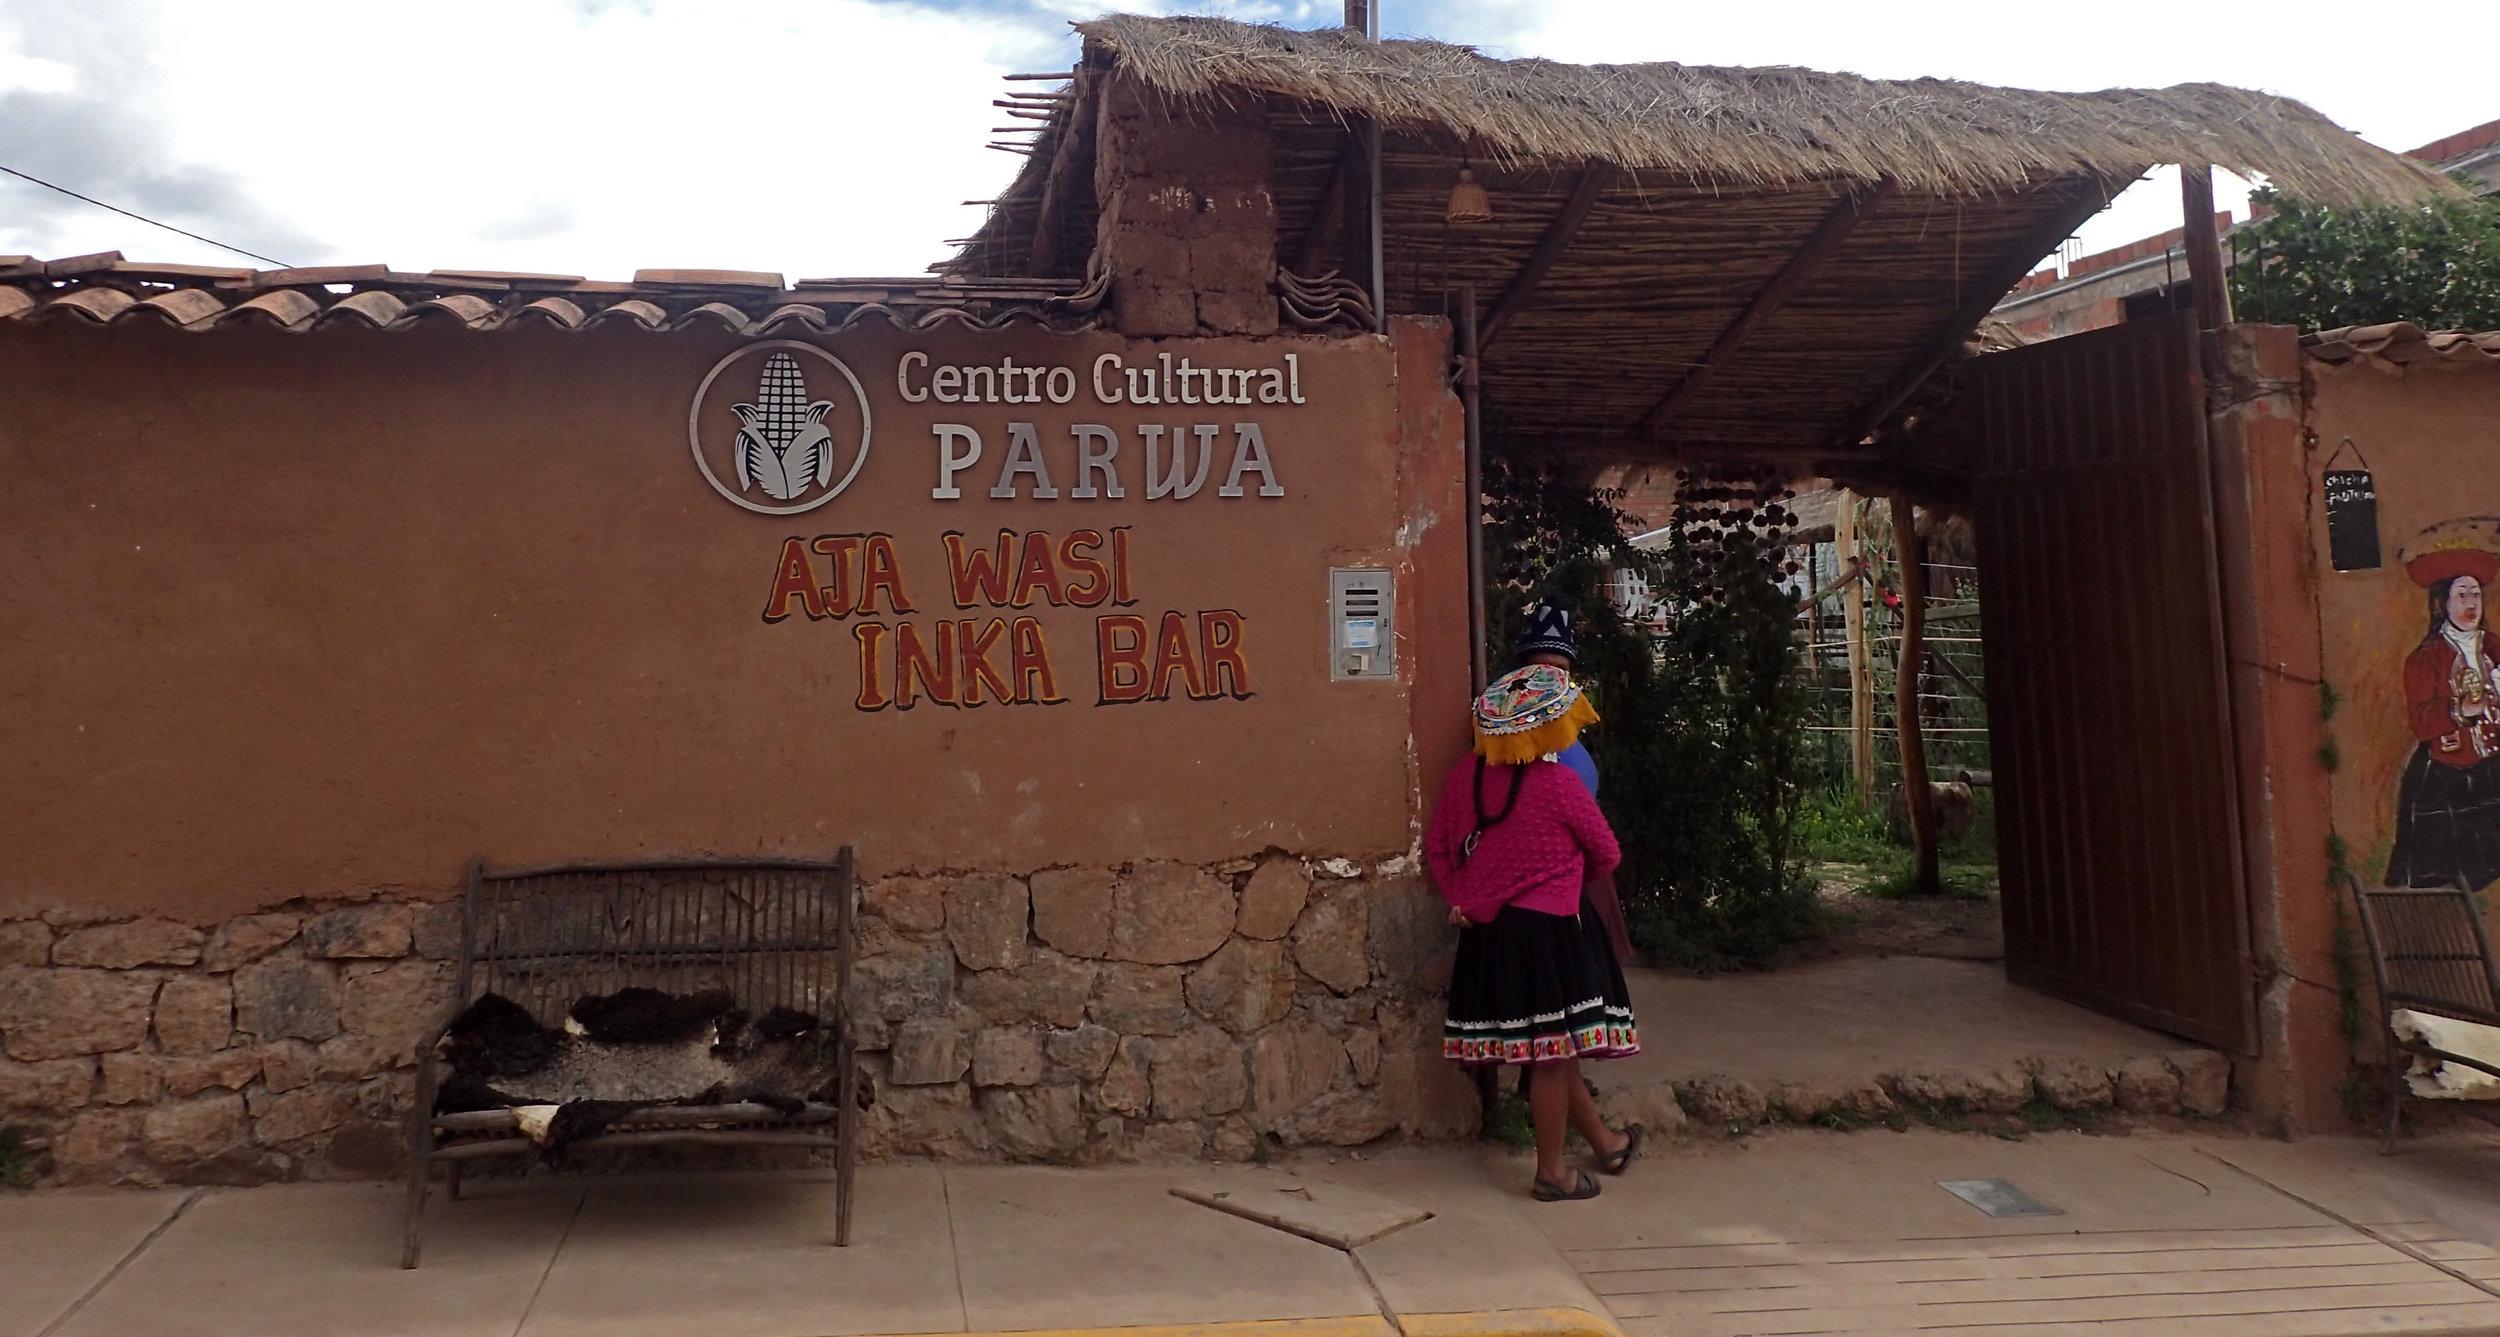 Centro Cultural Parwa.jpg